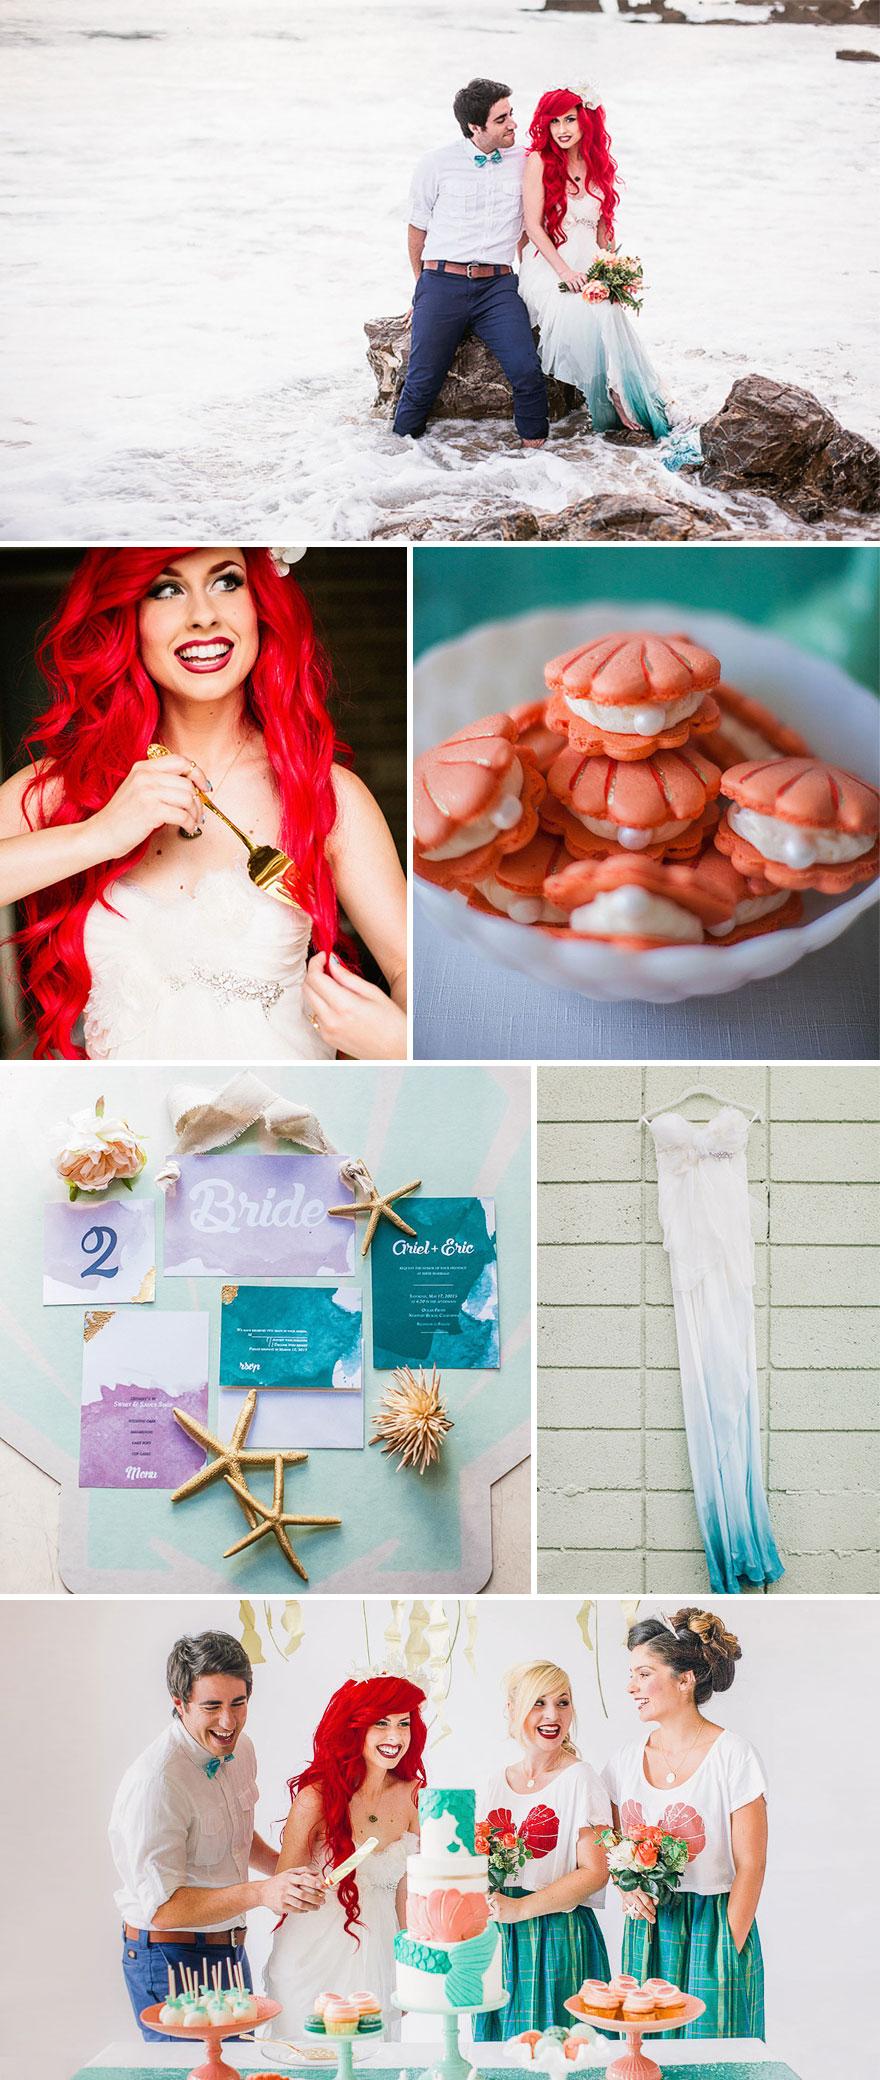 Kis hableány esküvő